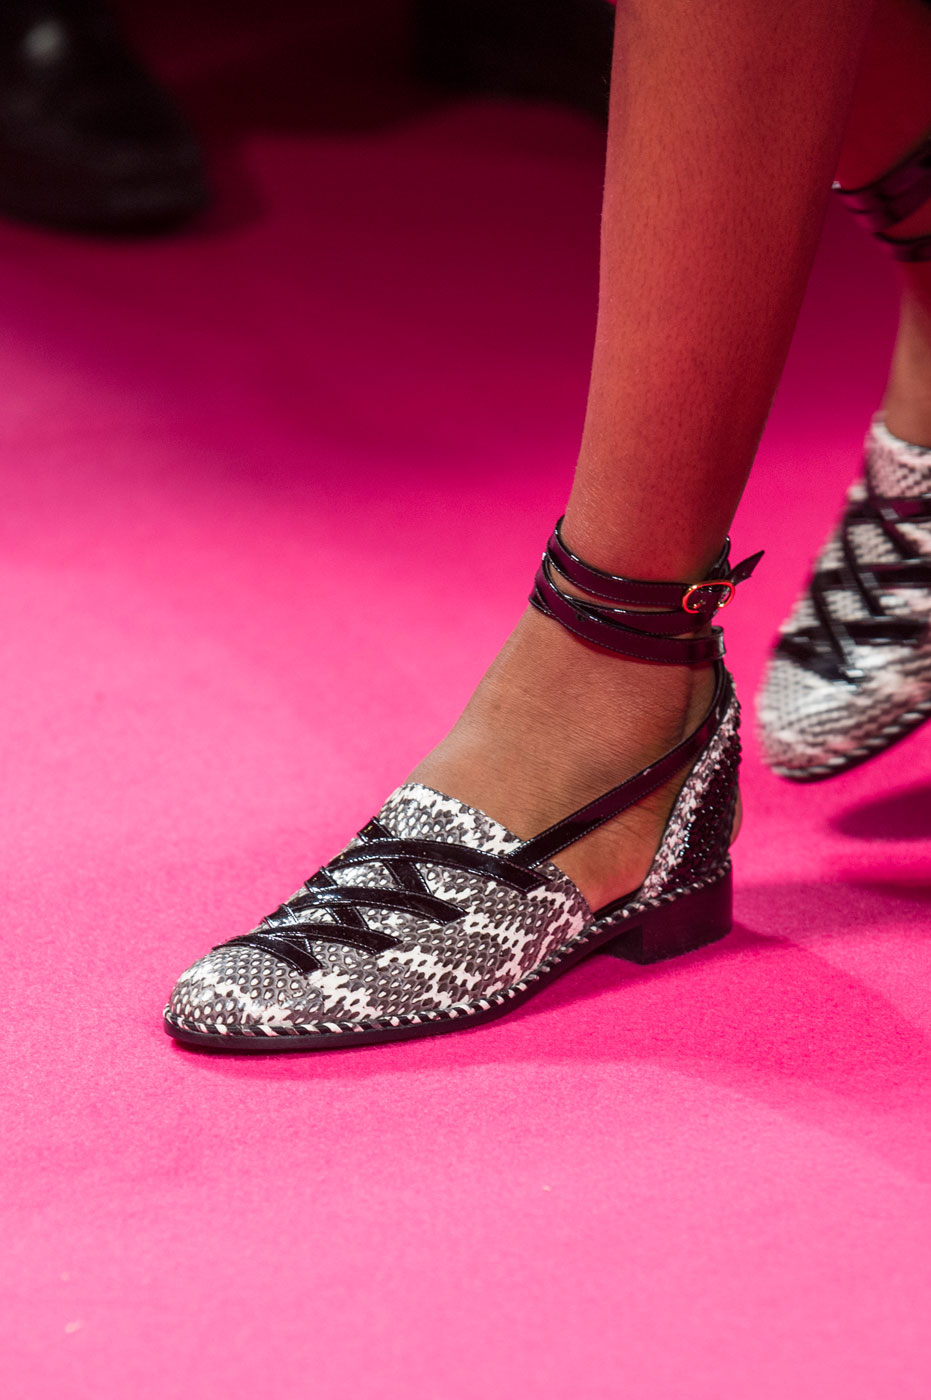 Schiaparelli-fashion-runway-show-close-ups-haute-couture-paris-spring-summer-2015-the-impression-57